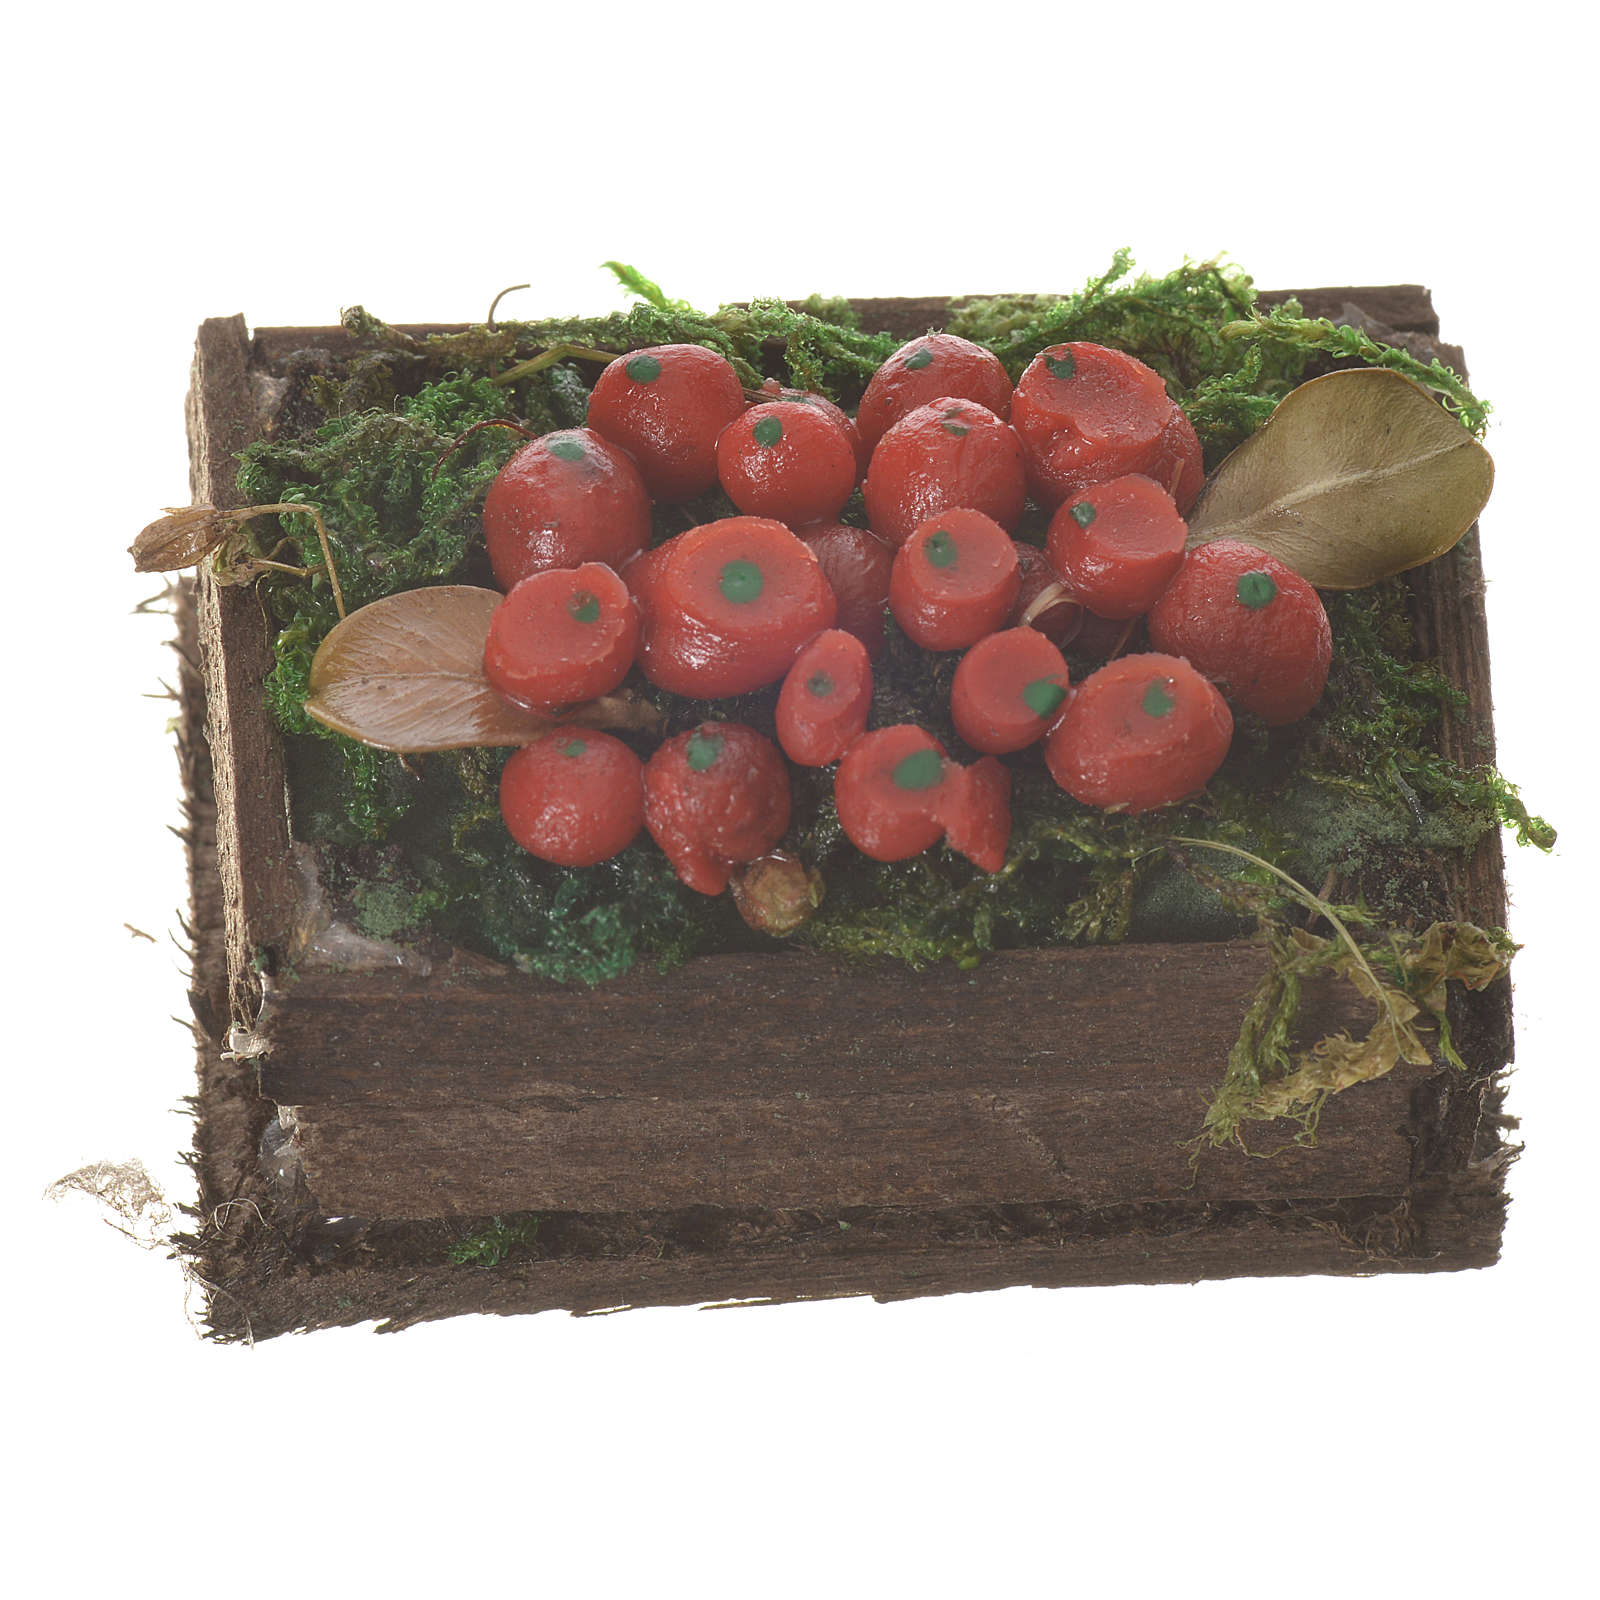 Cassetta frutta rossa cera figure presepe 20-24 cm 4